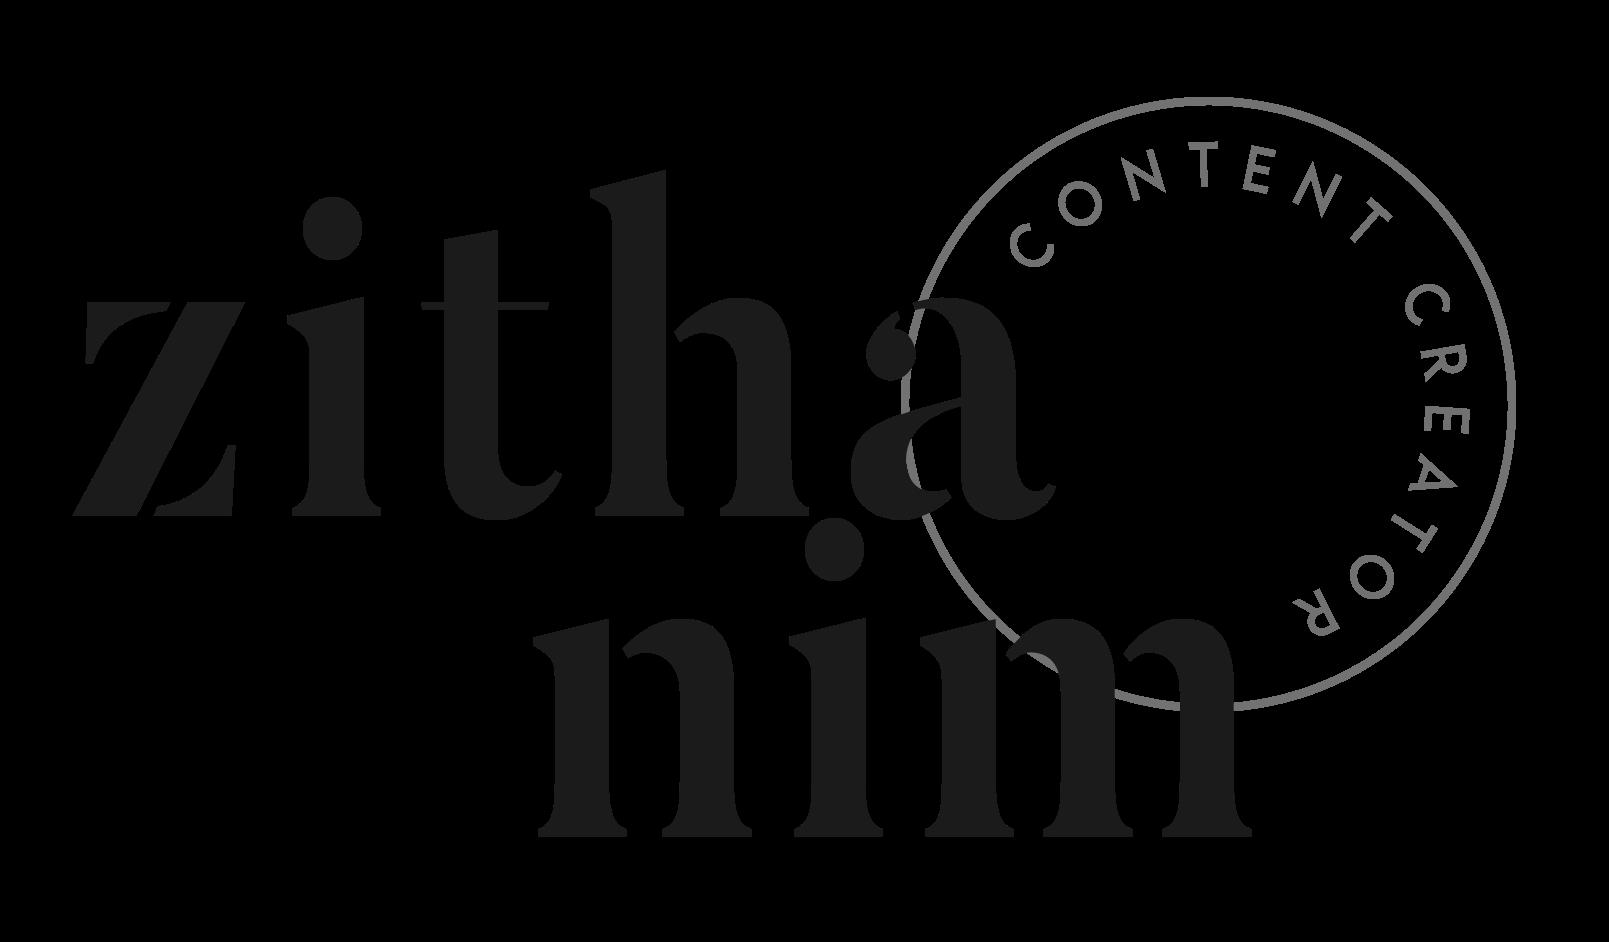 Zitha Nim | Graphic designer & videographer